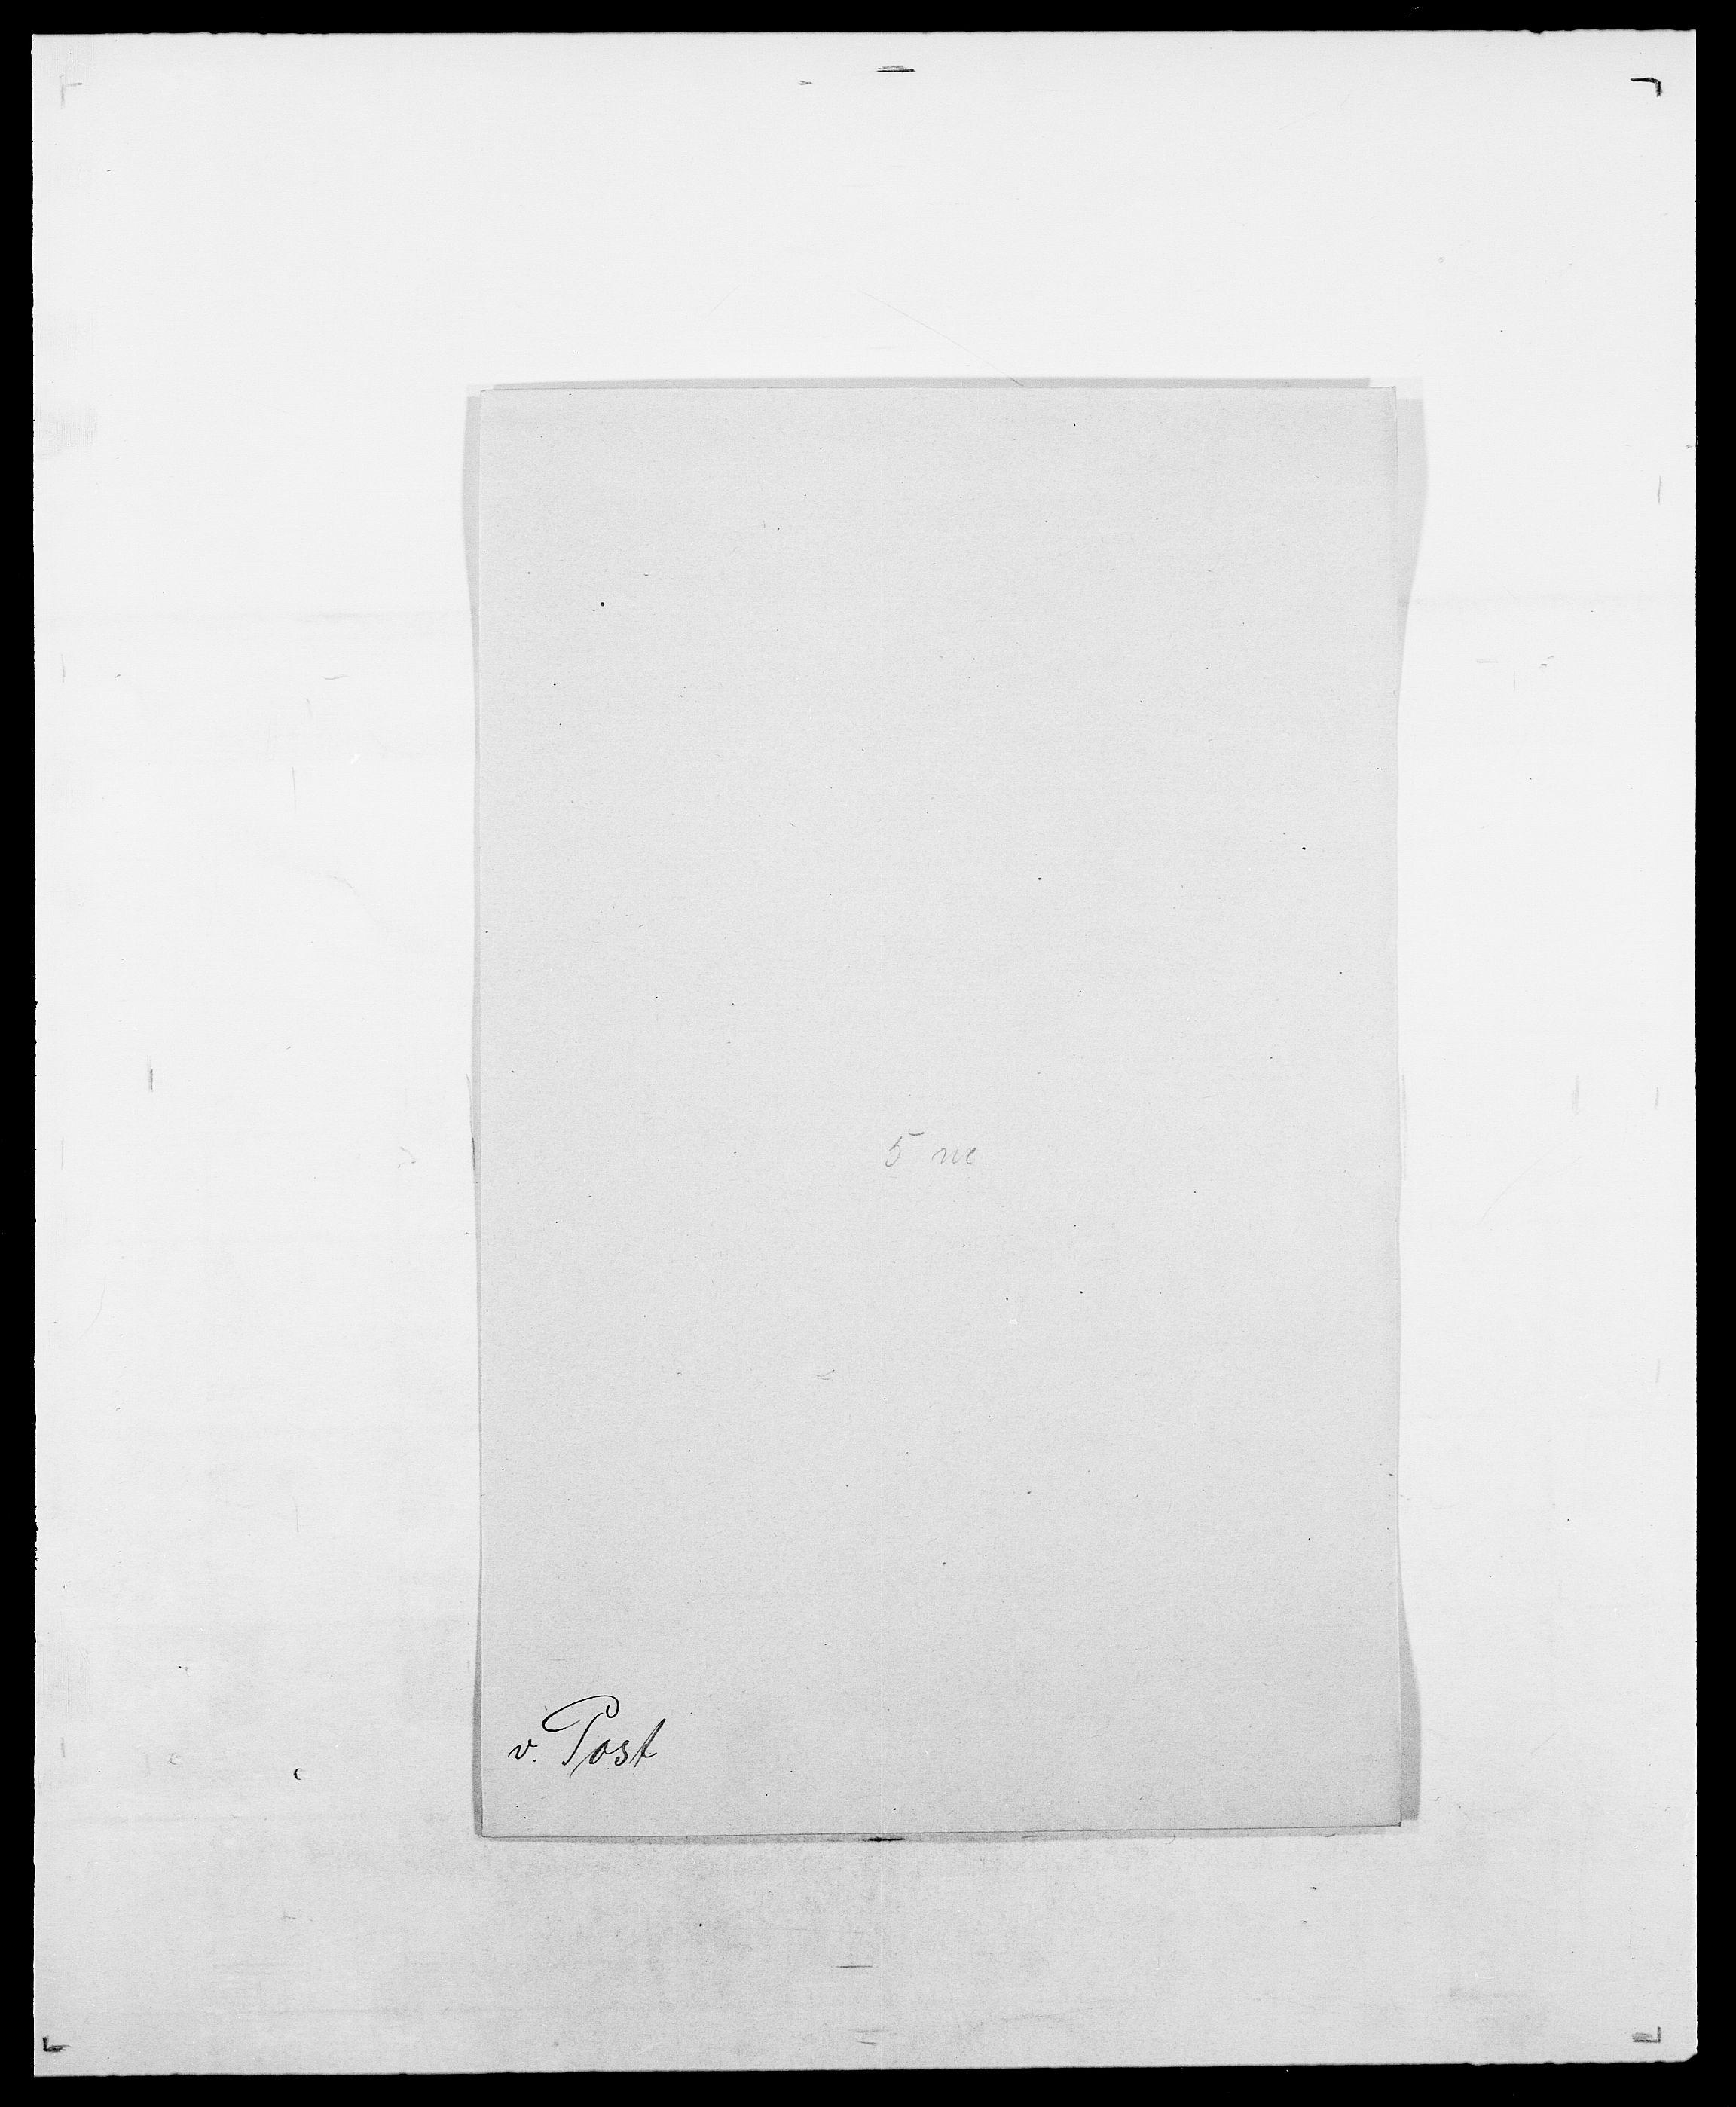 SAO, Delgobe, Charles Antoine - samling, D/Da/L0031: de Place - Raaum, s. 255